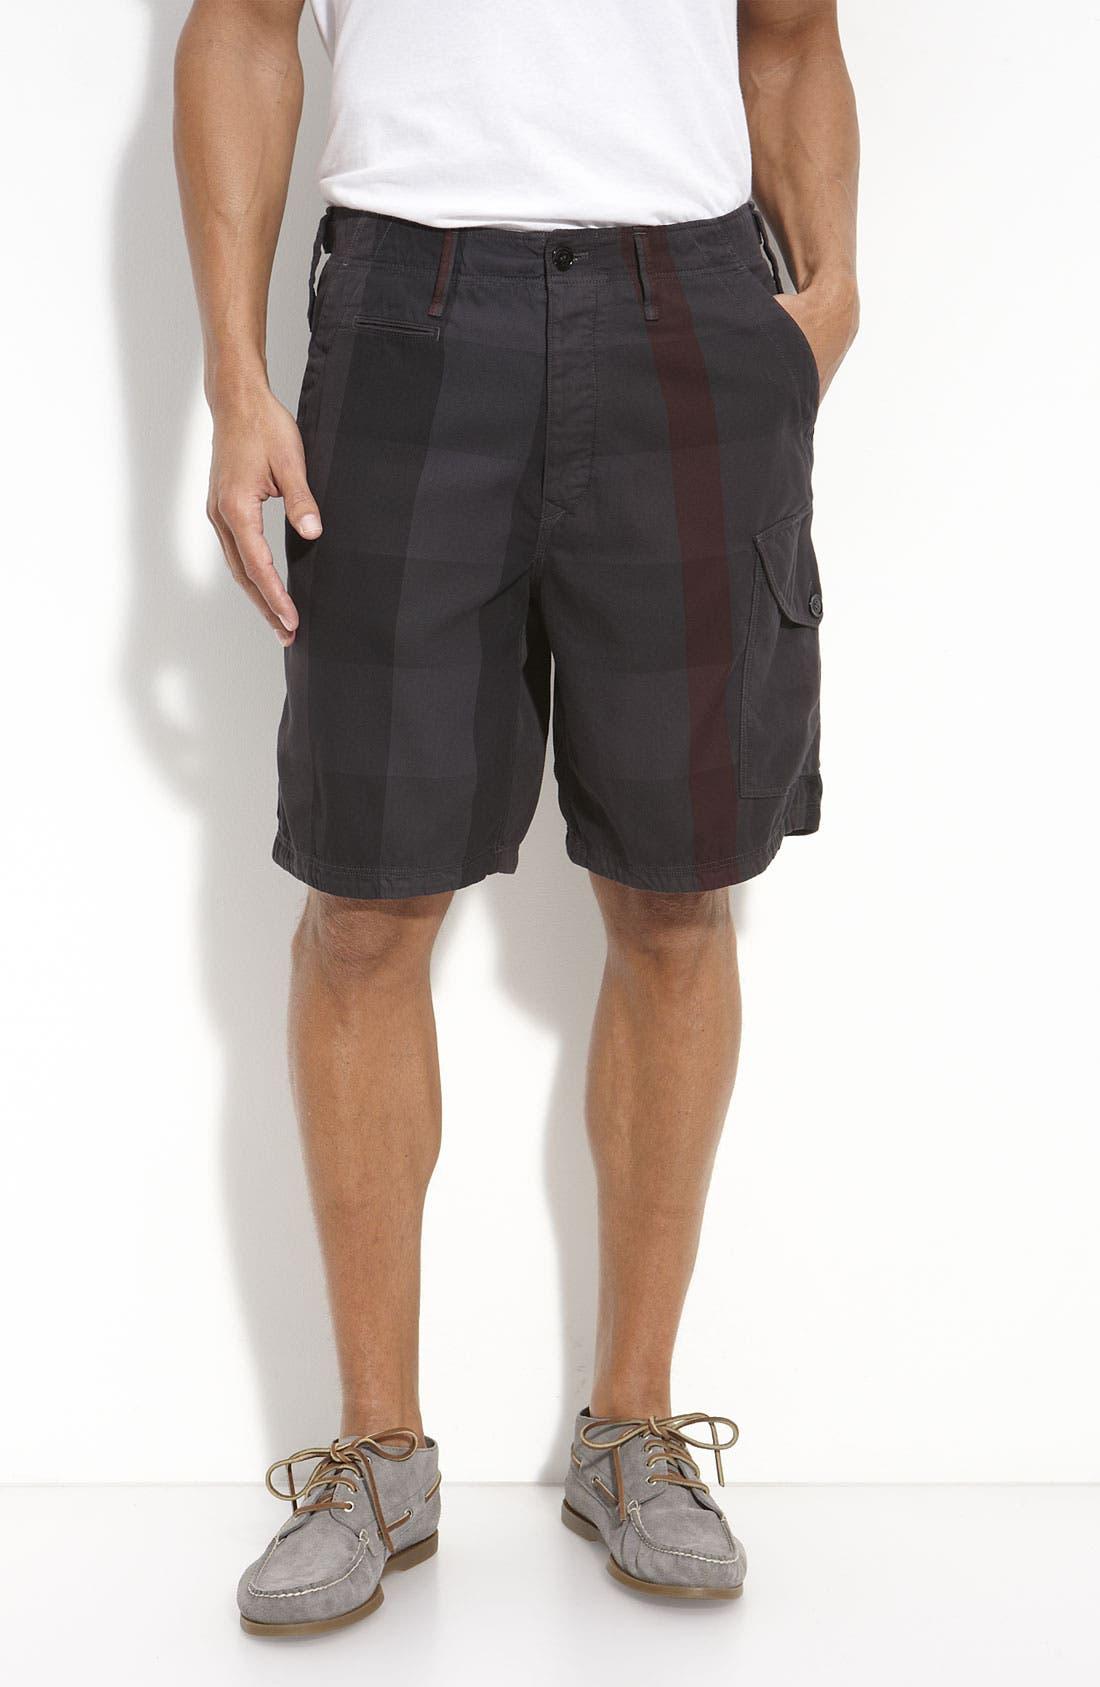 BURBERRY Brit Check Print Shorts, Main, color, 020